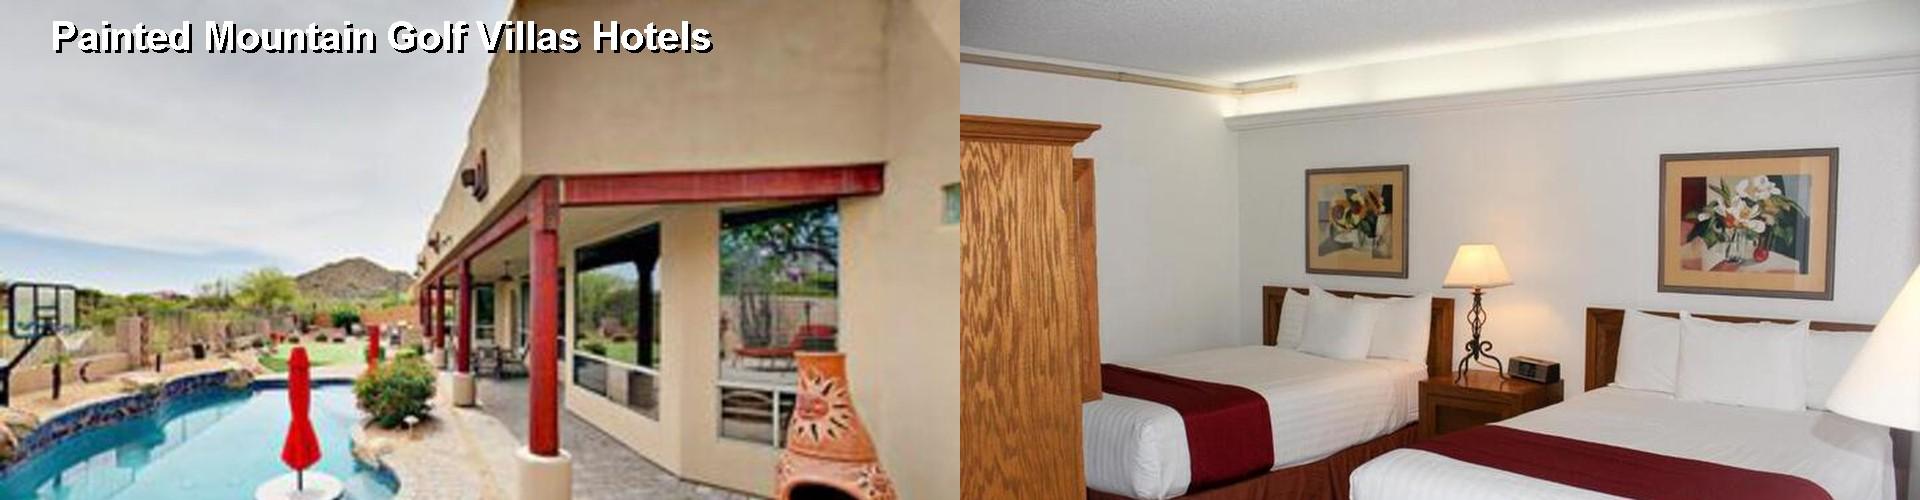 $53+ hotels near painted mountain golf villas in mesa (az)